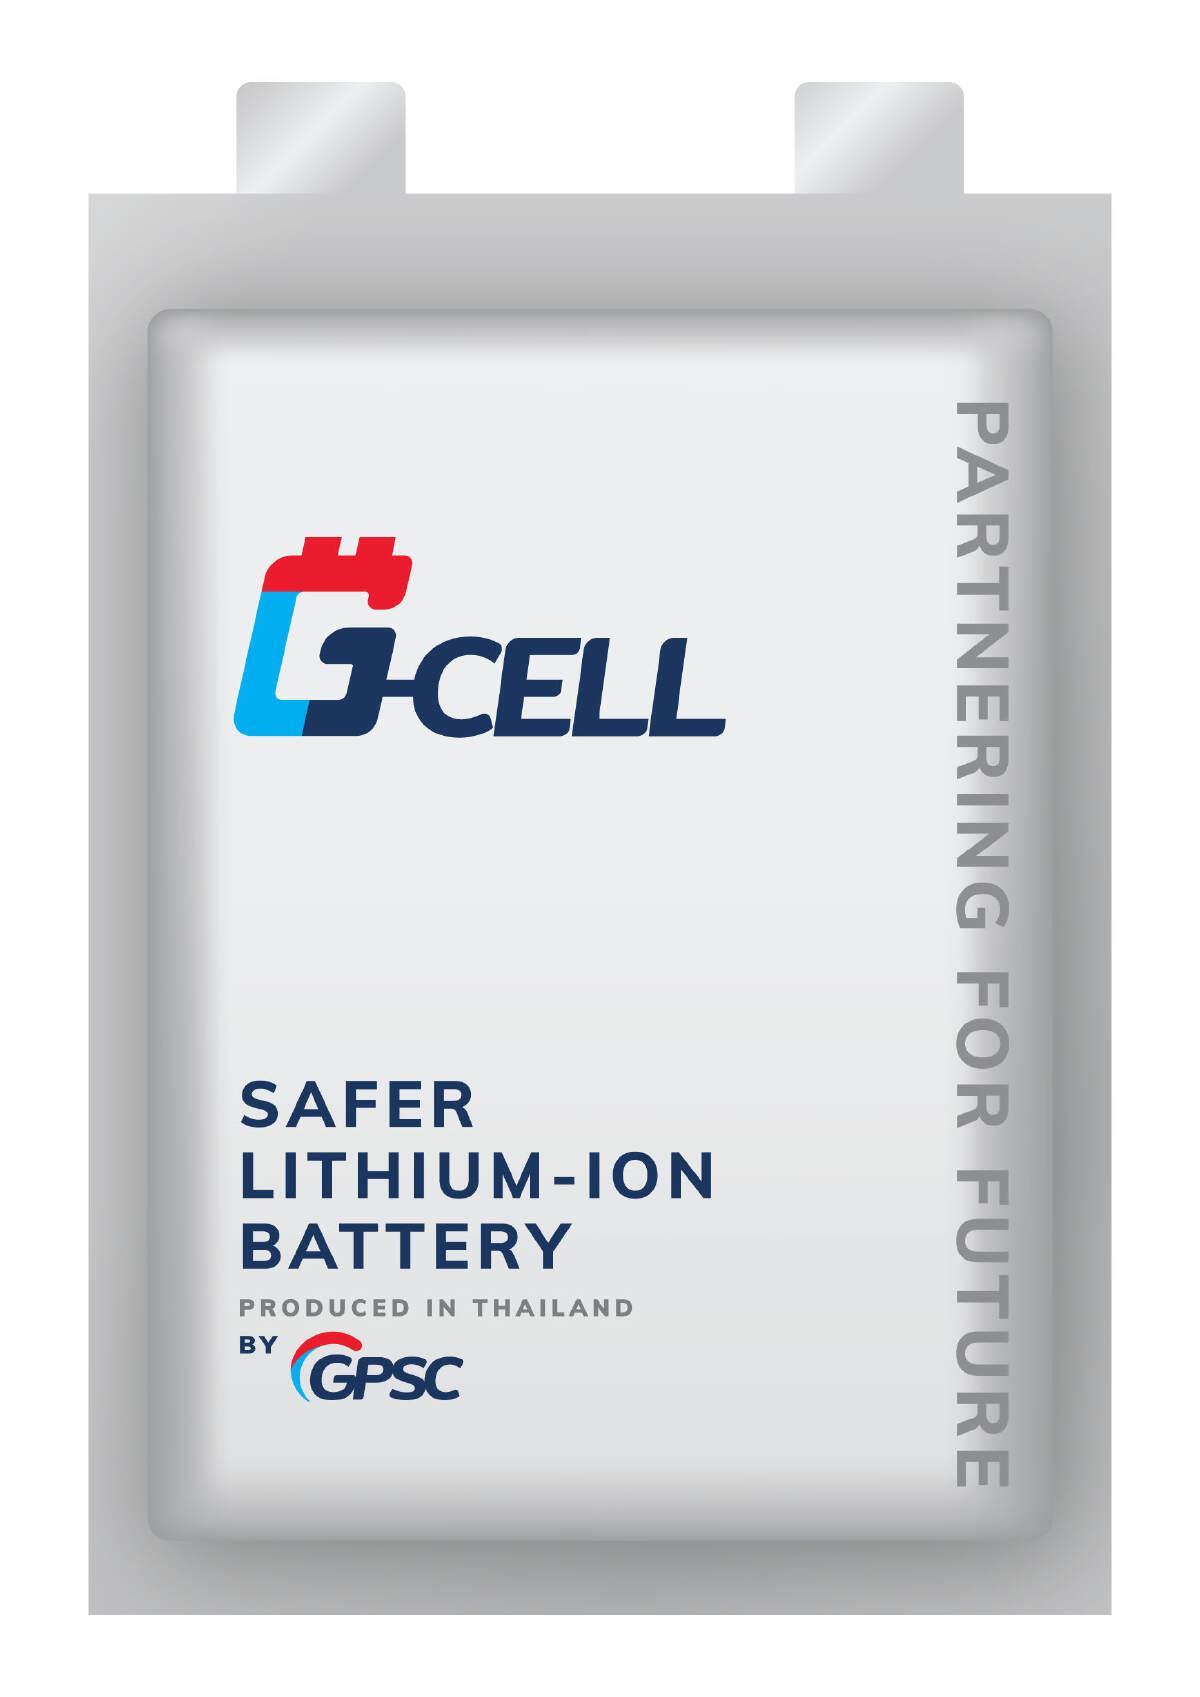 GPSC คิกออฟโรงงานผลิตหน่วยกักเก็บพลังงาน G-Cell ด้วยเทคโนโลยี SemiSolid แห่งแรกในอาเซียน